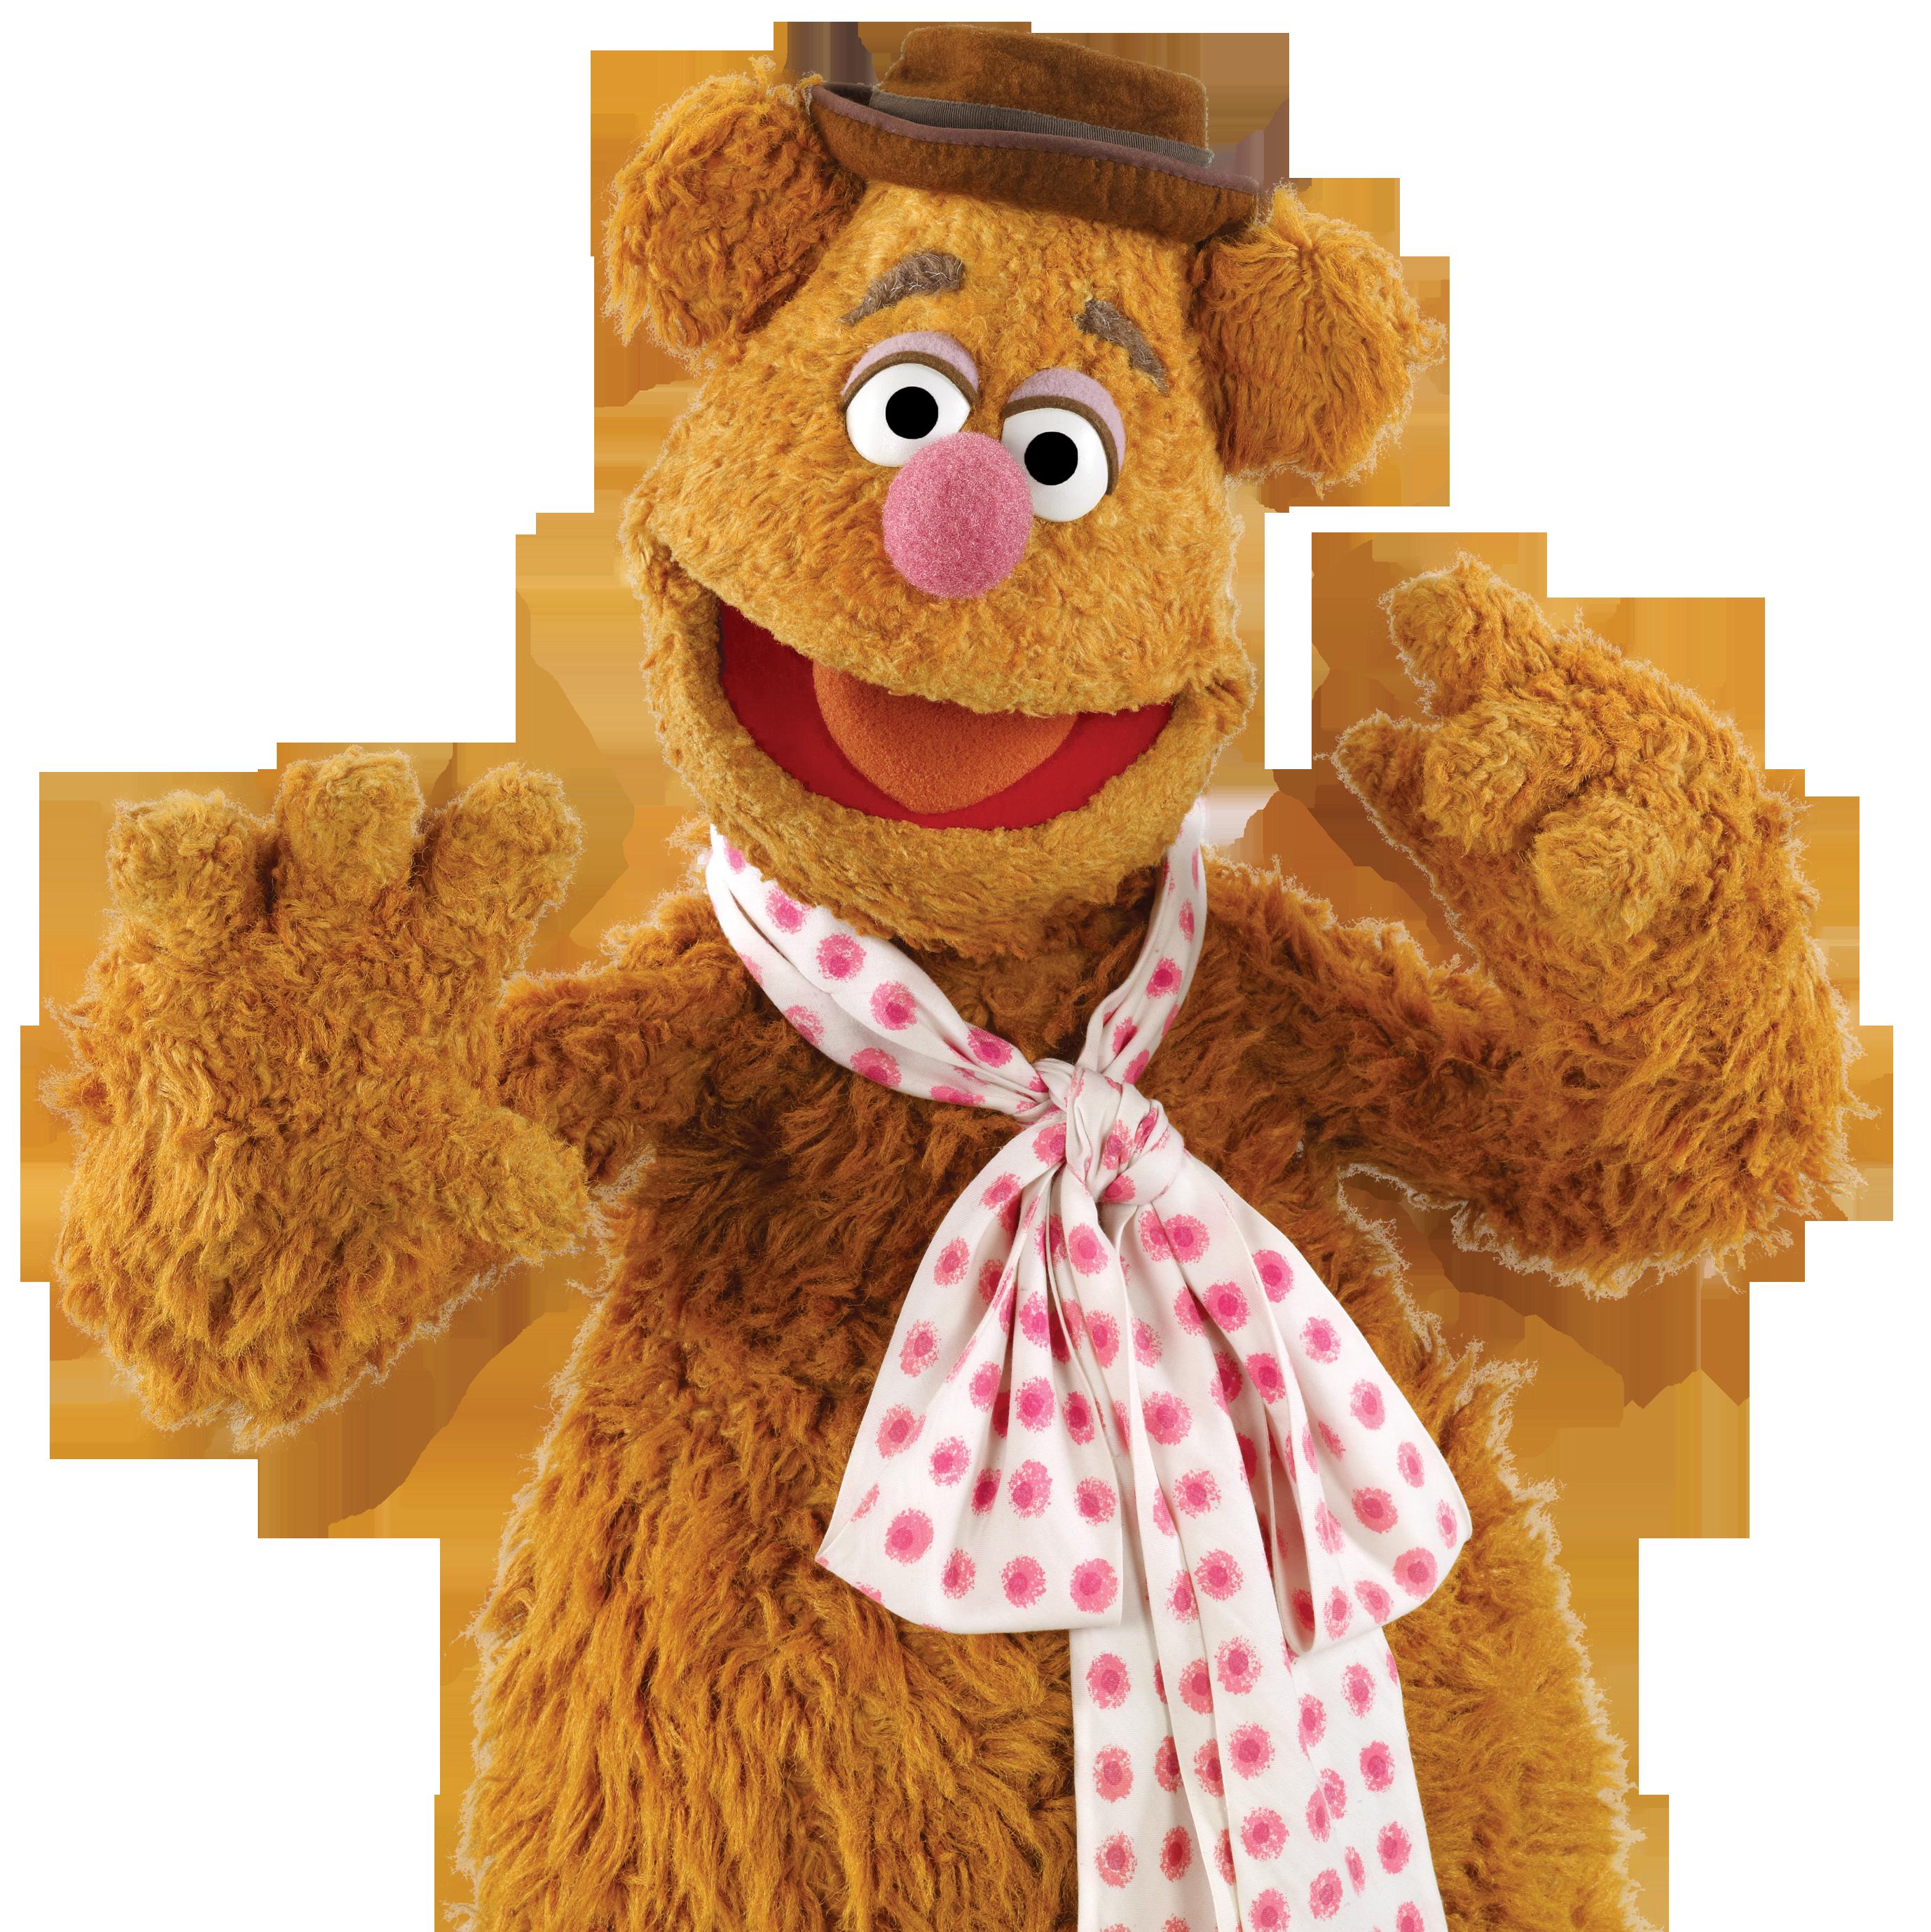 Fozzie Muppet 2015 Images